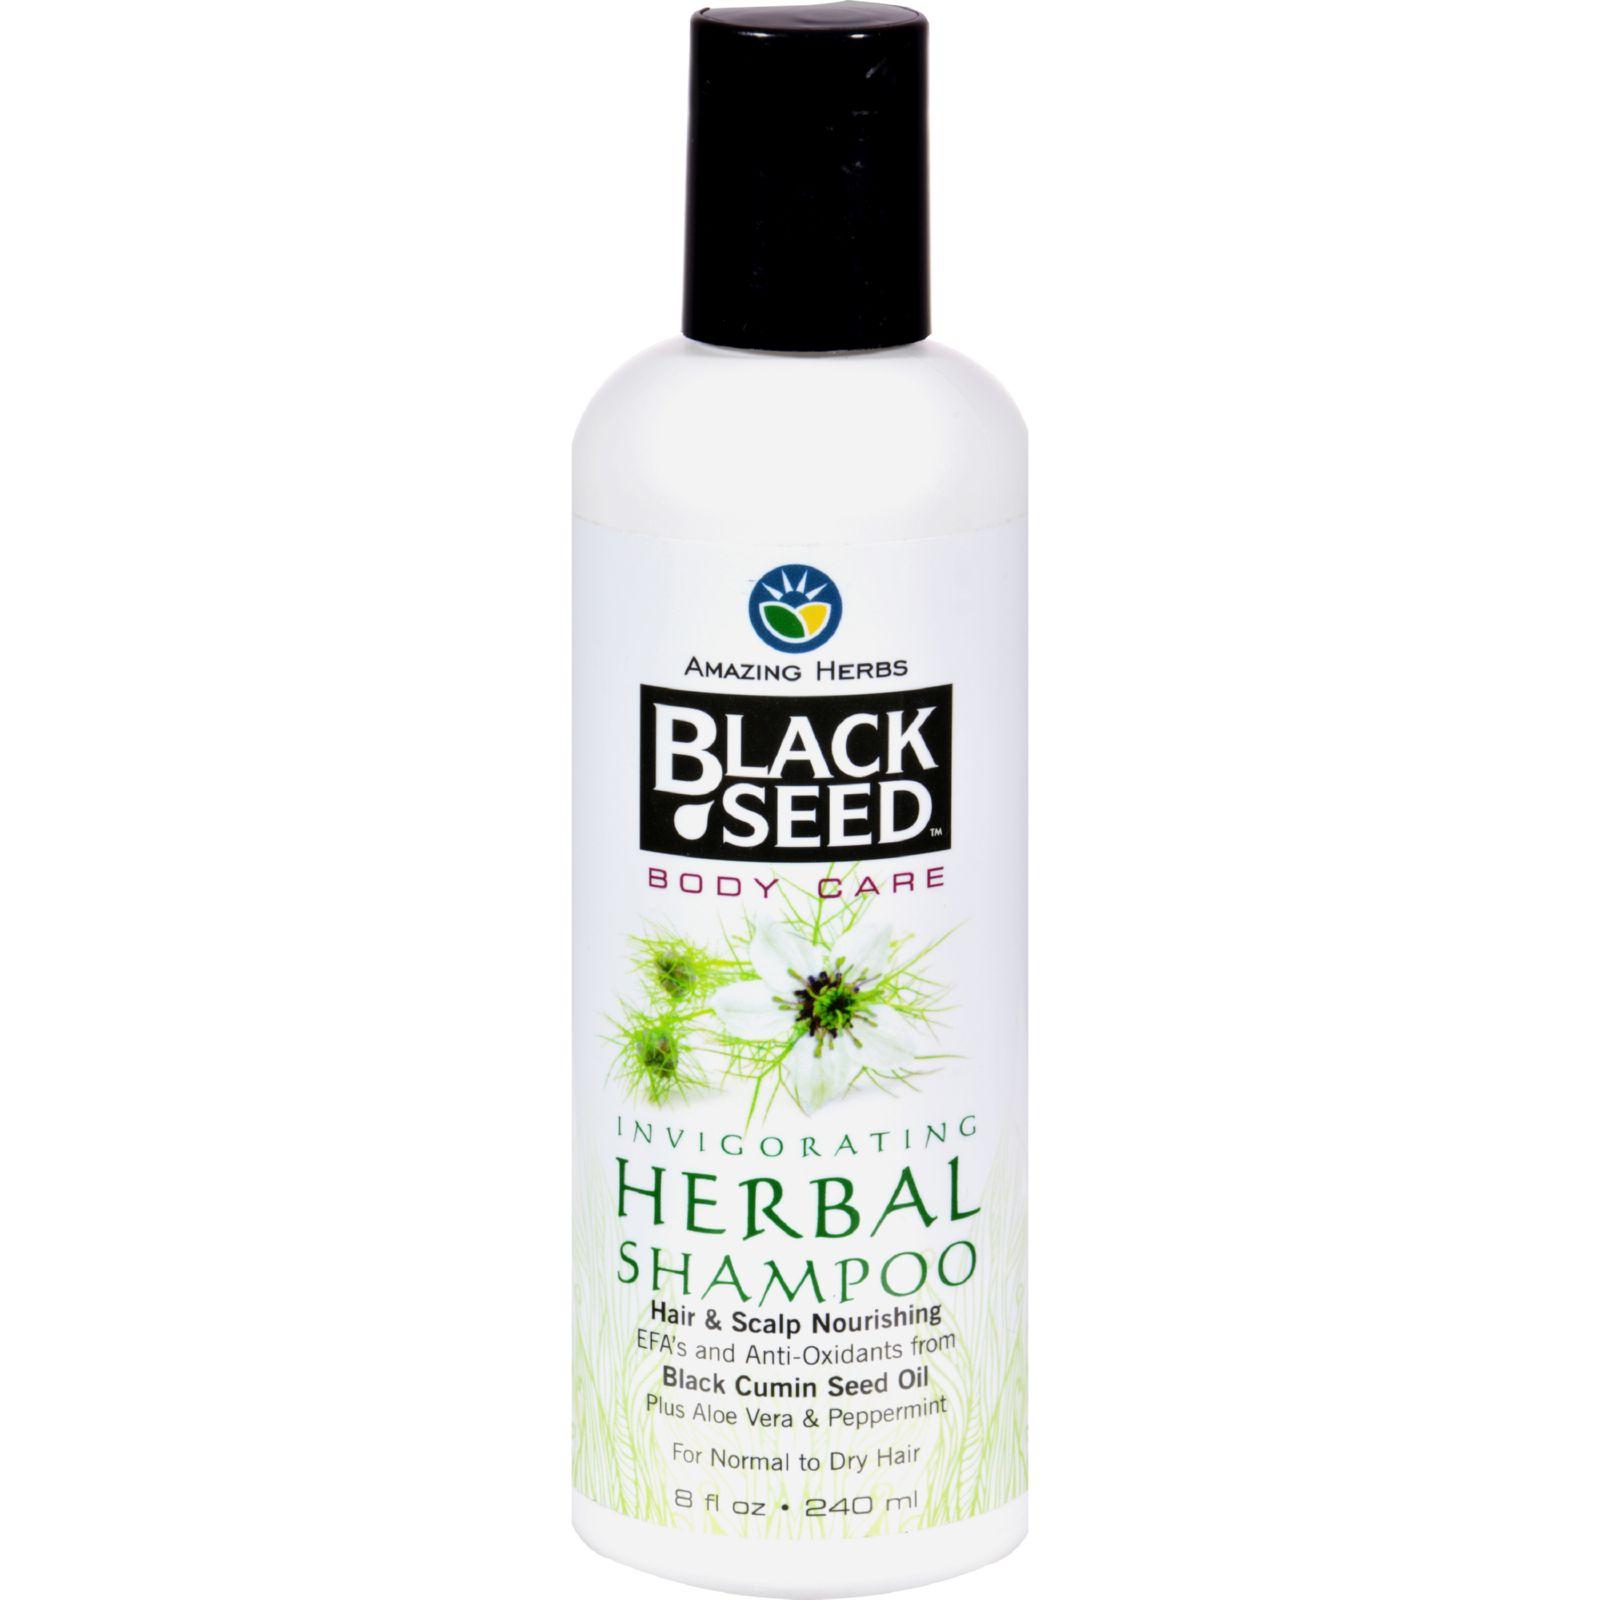 Black Seed Shampoo - Herbal - 8 oz